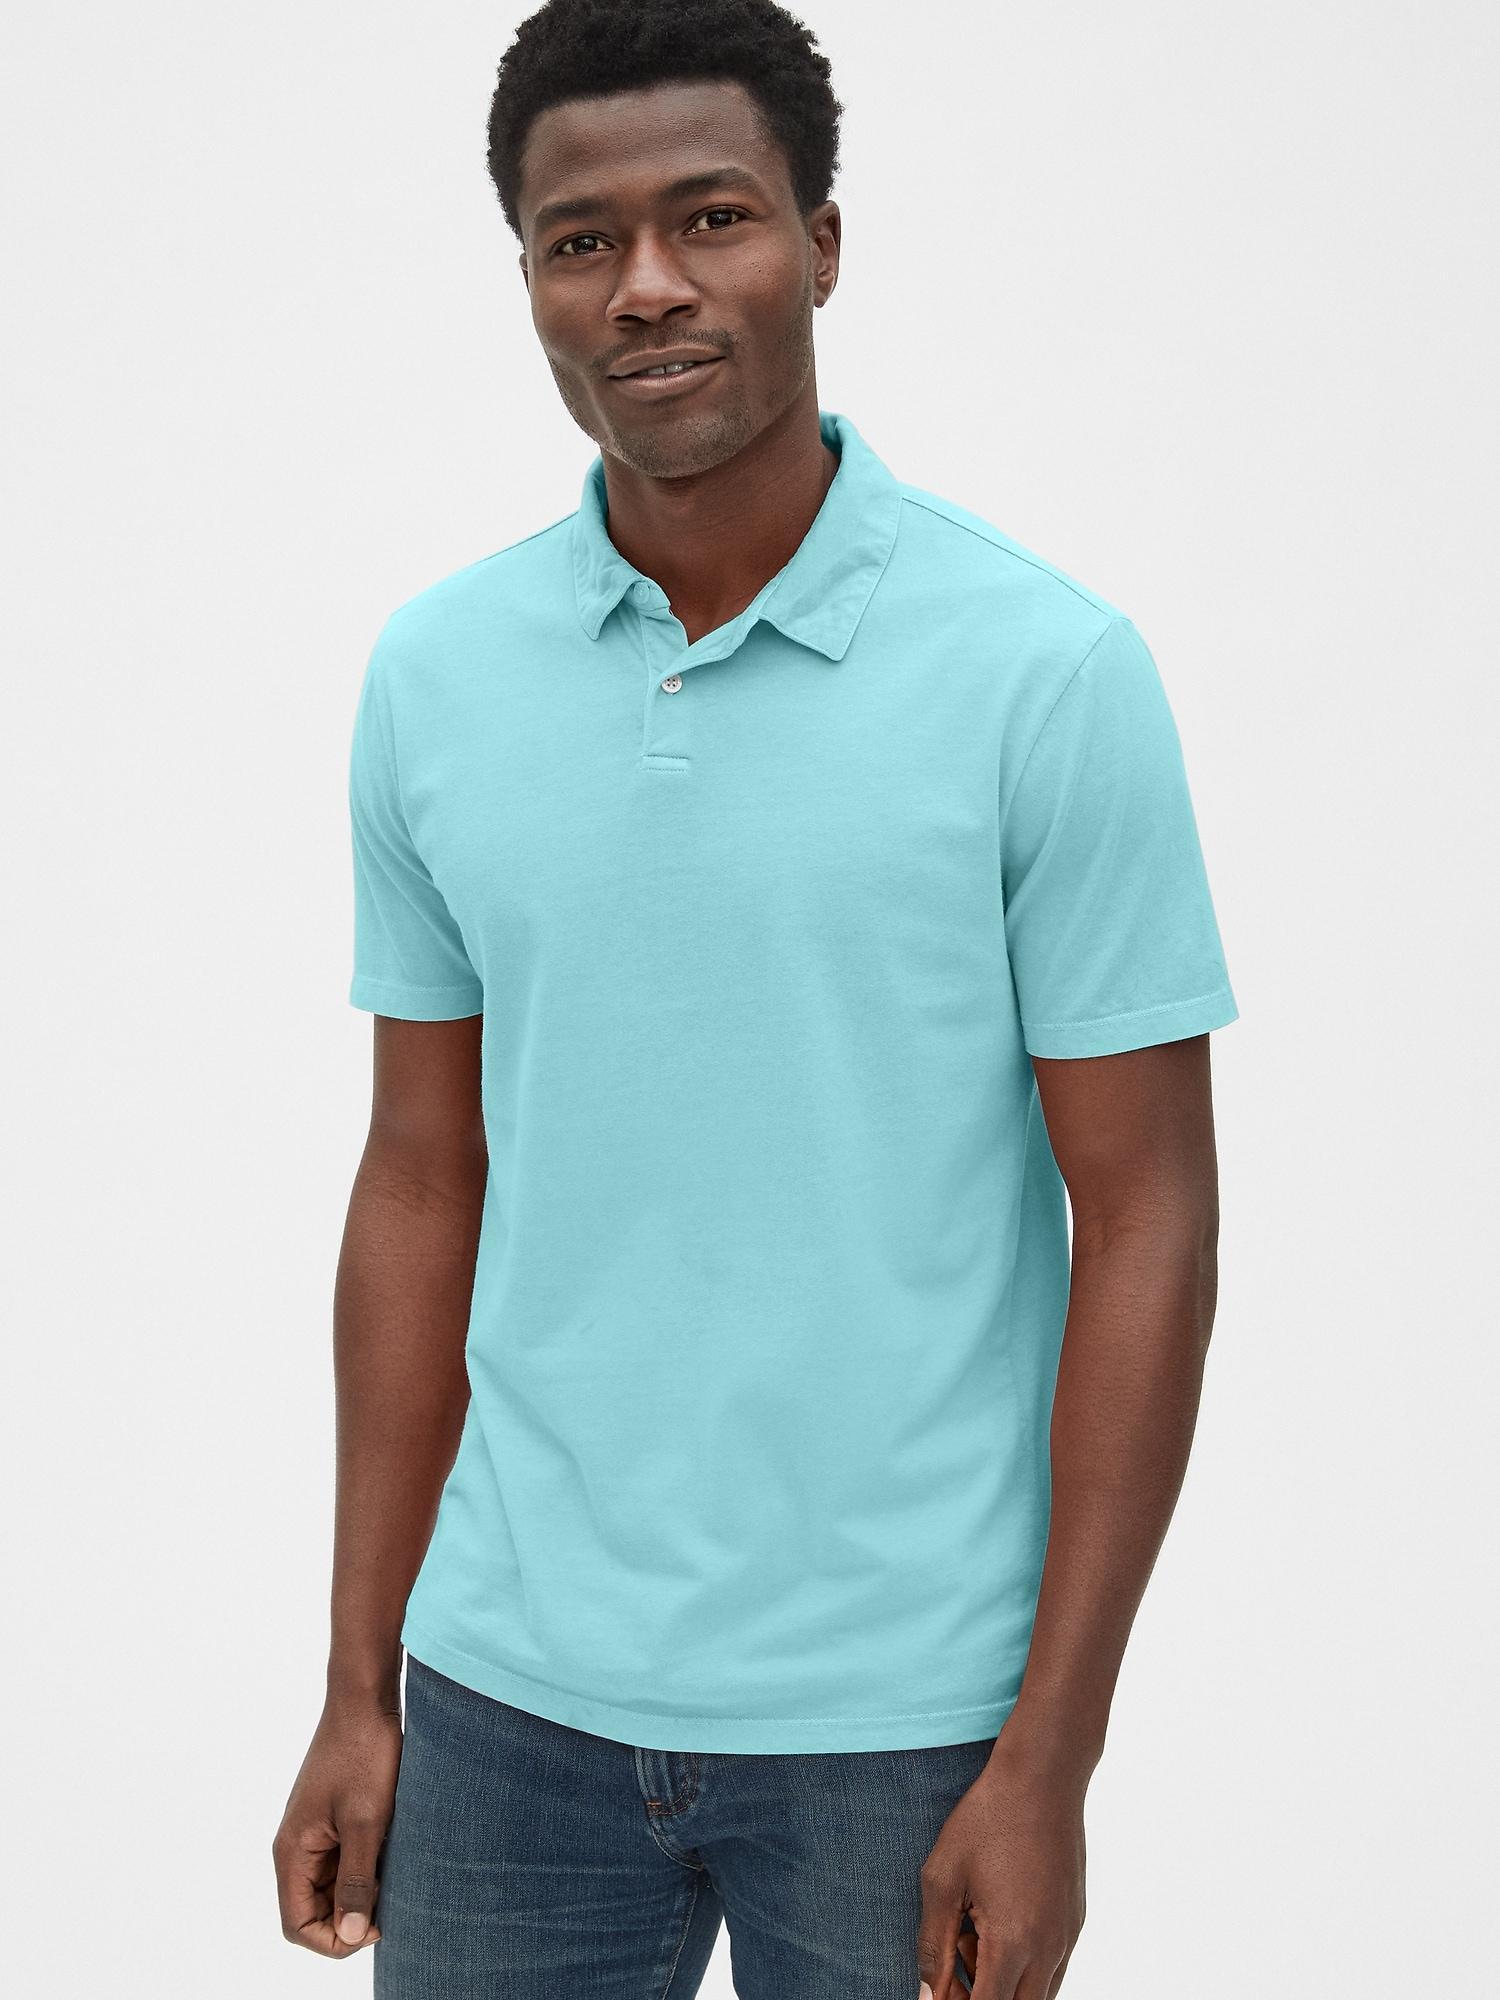 3e1869cd1 Lyst - Gap Vintage Soft Polo Shirt in Blue for Men